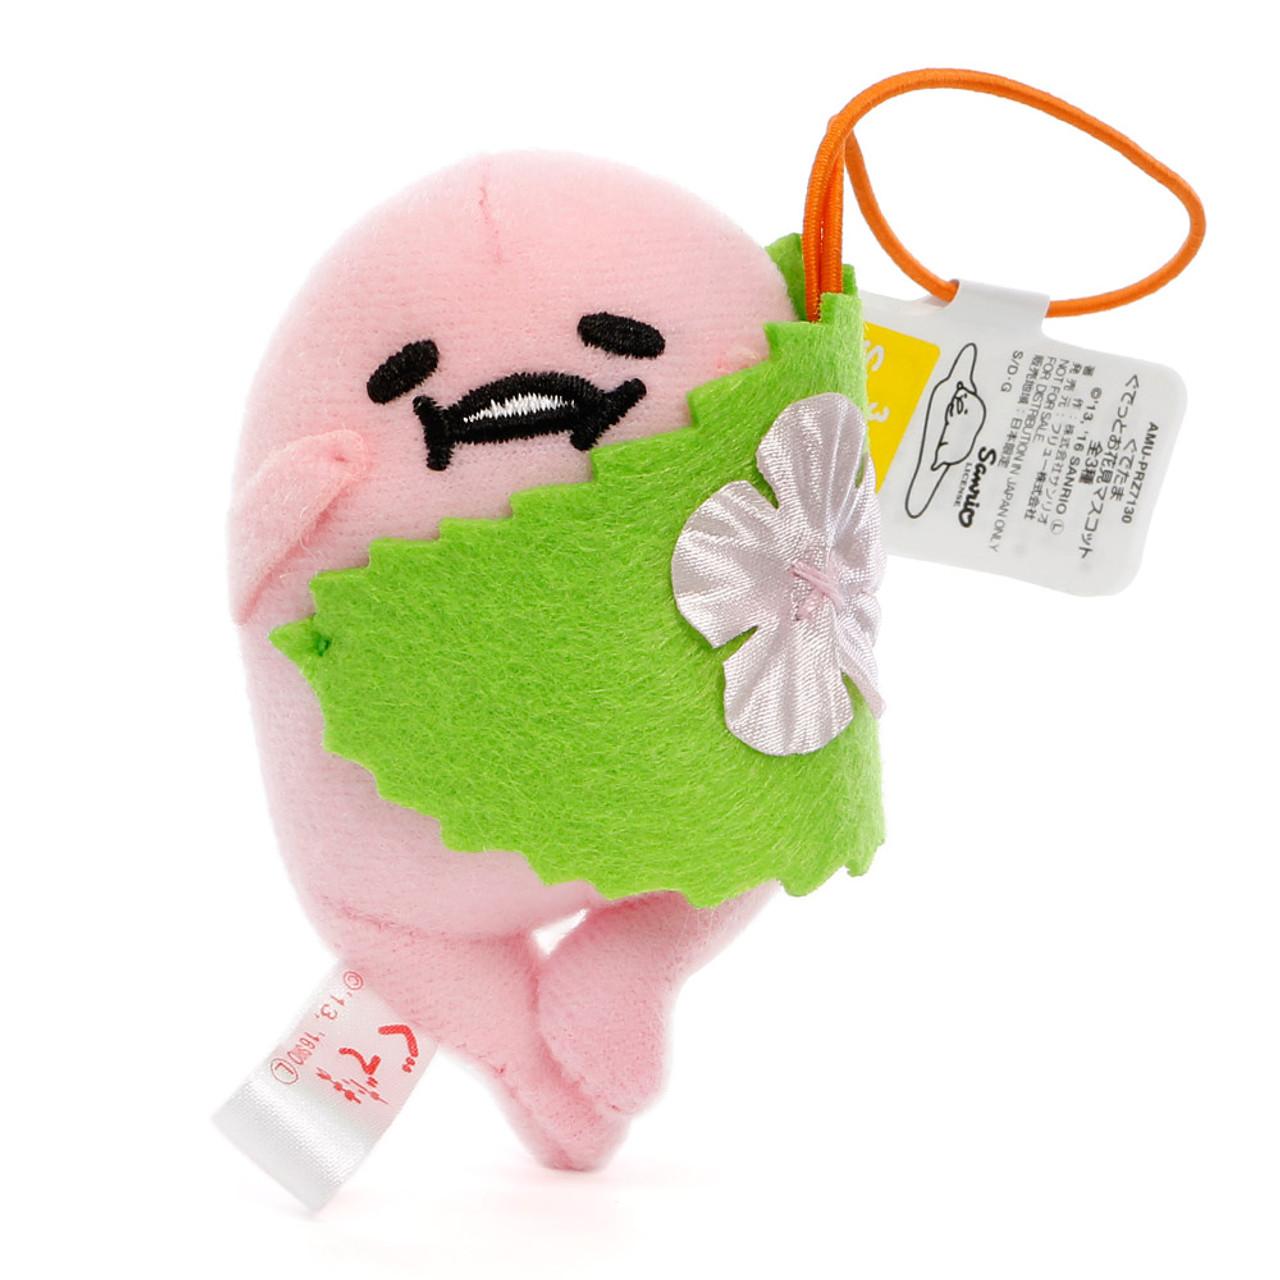 12% off | Sanrio Gudetama Lazy Egg Sakura Mascot Plush Charms - Cherry  Blossom Rice Cake